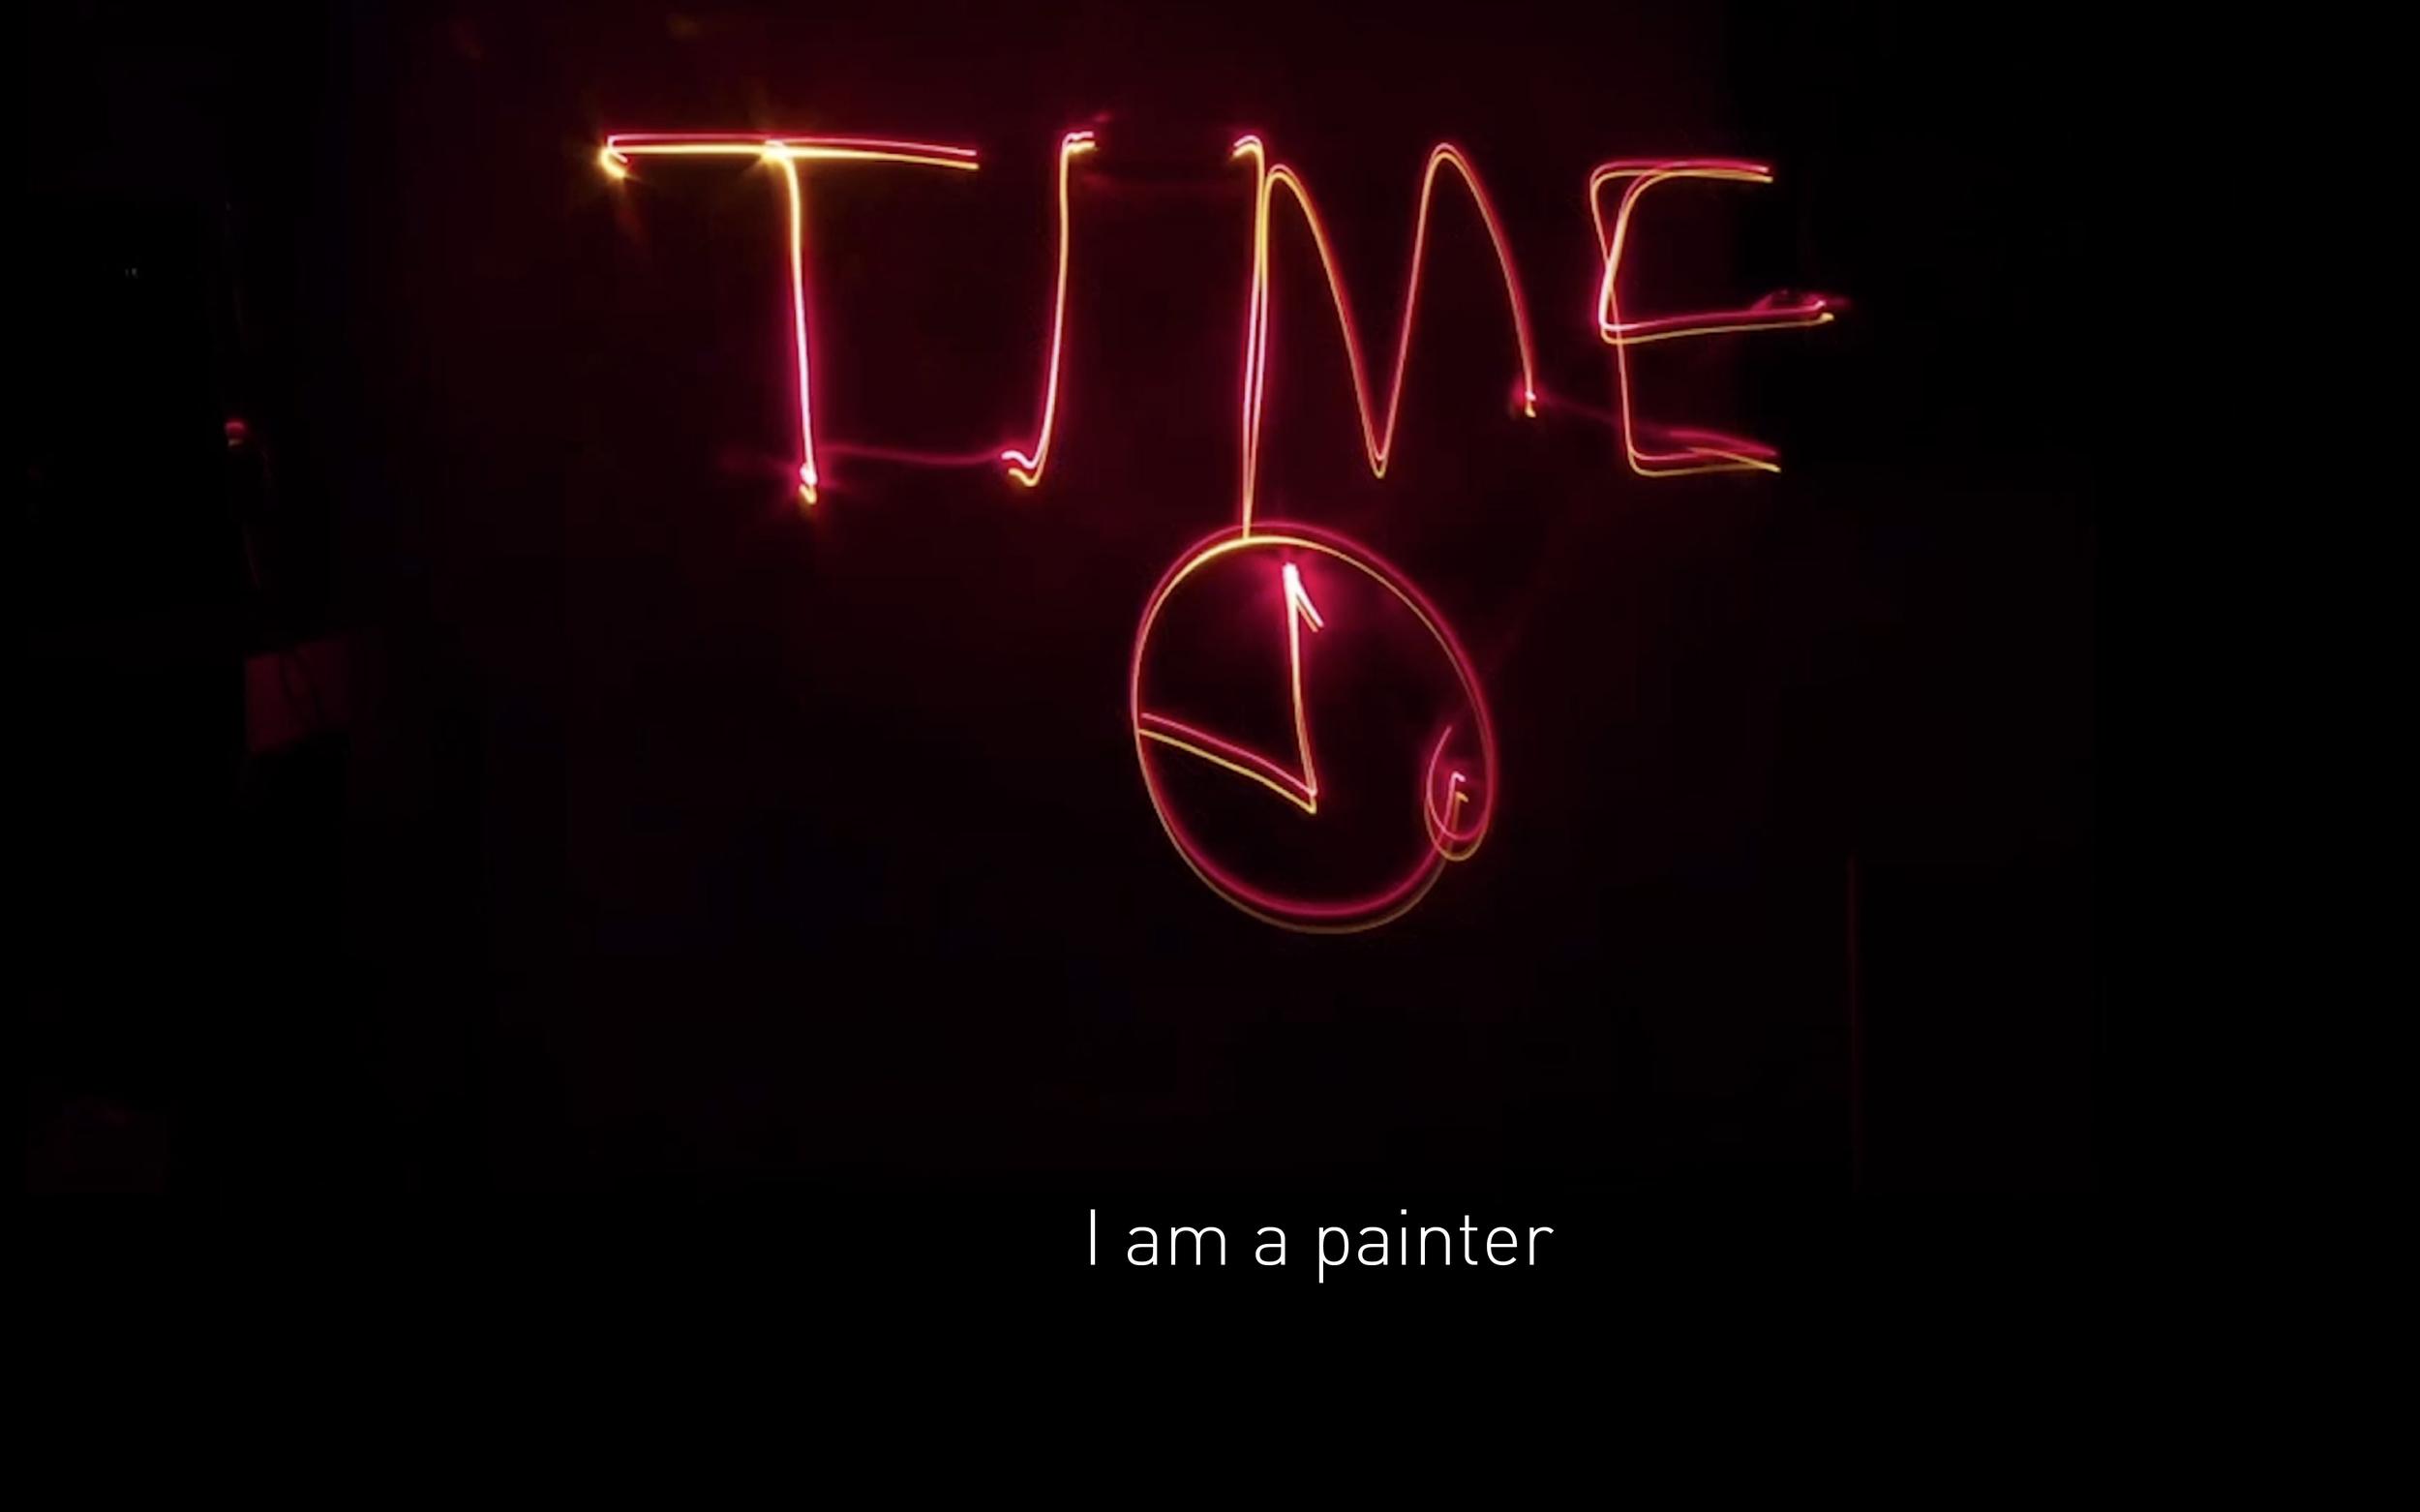 Painter-01.jpg